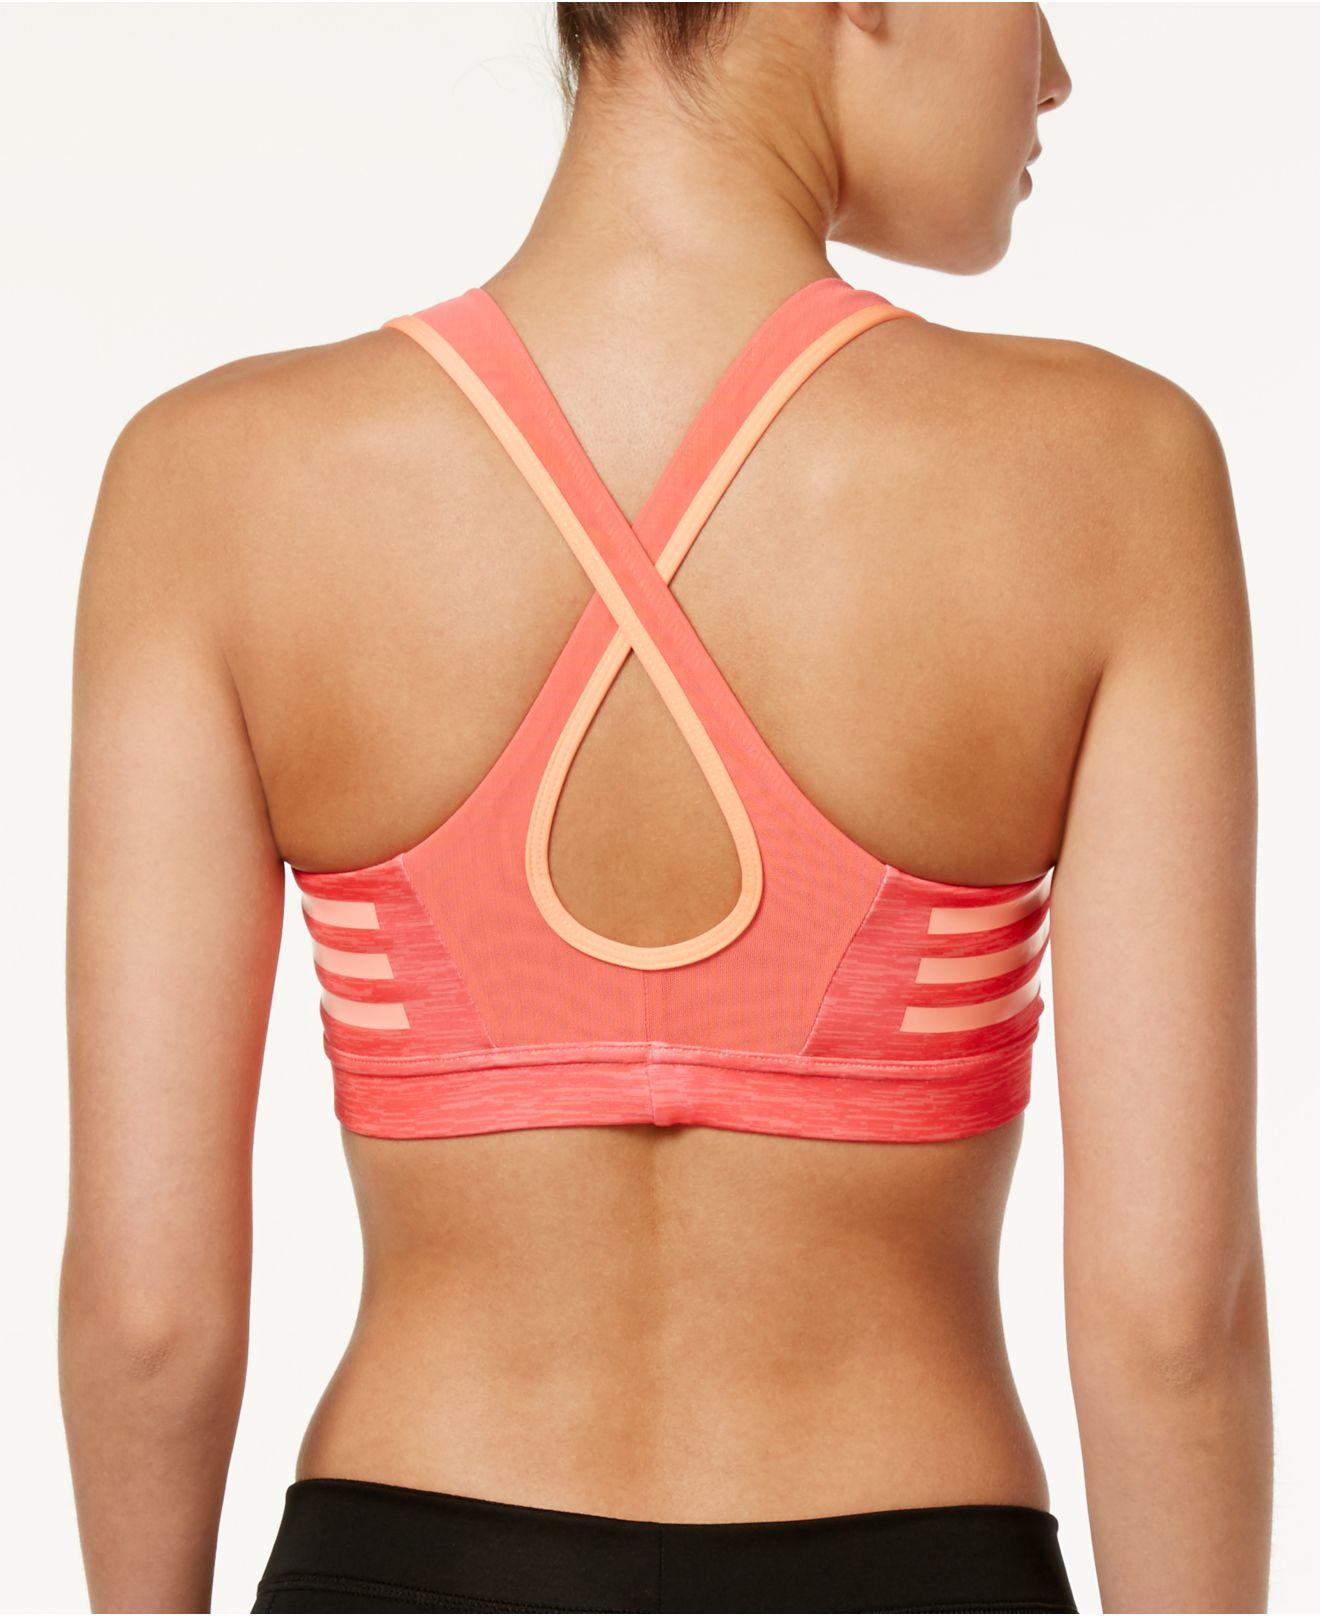 Adidas Climacool® High-impact Sports Bra